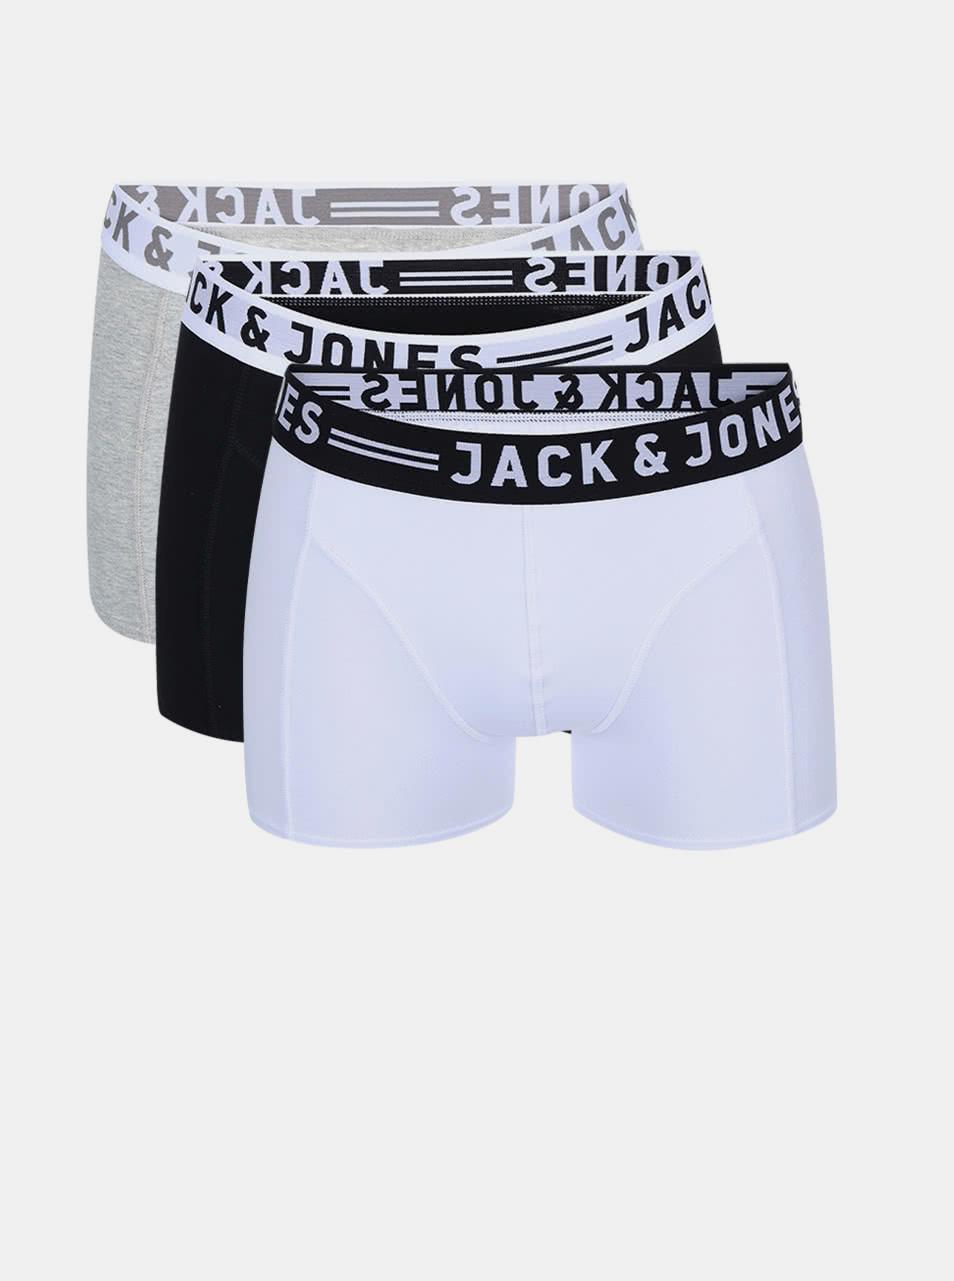 Set of three boxers in grey, white and black Jack & Jones Sense